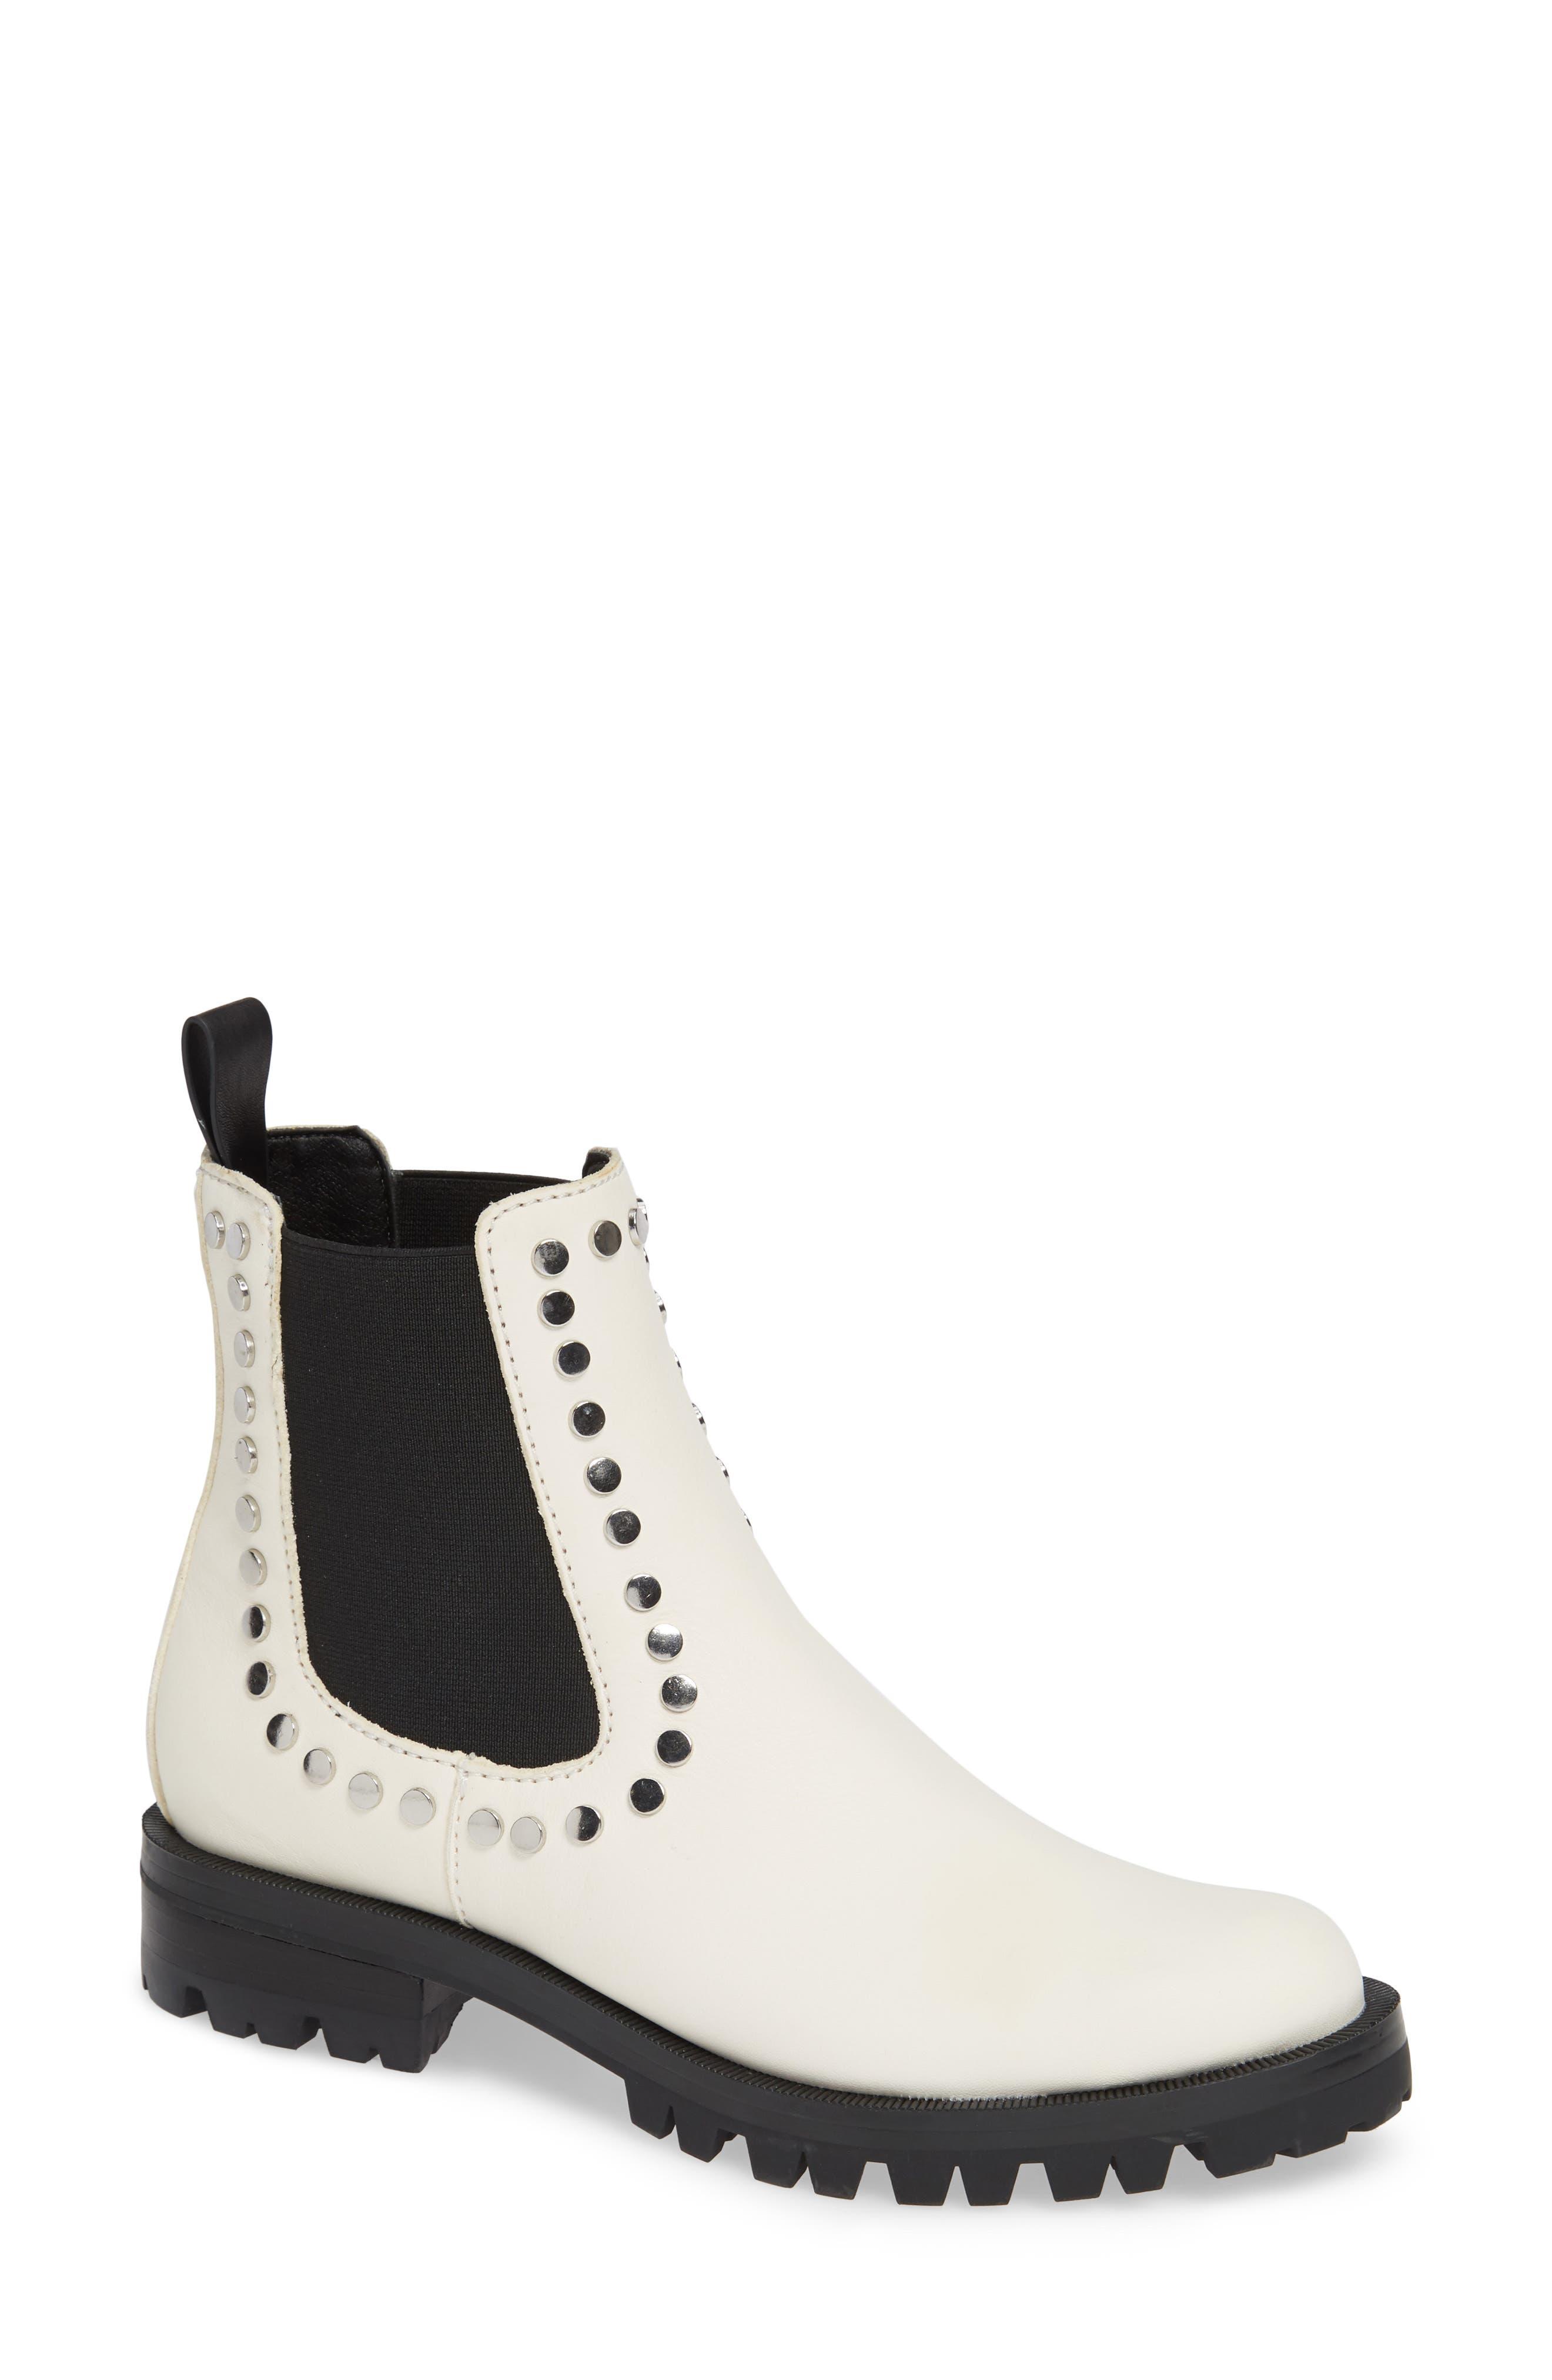 Dolce Vita Peton Boot, Ivory